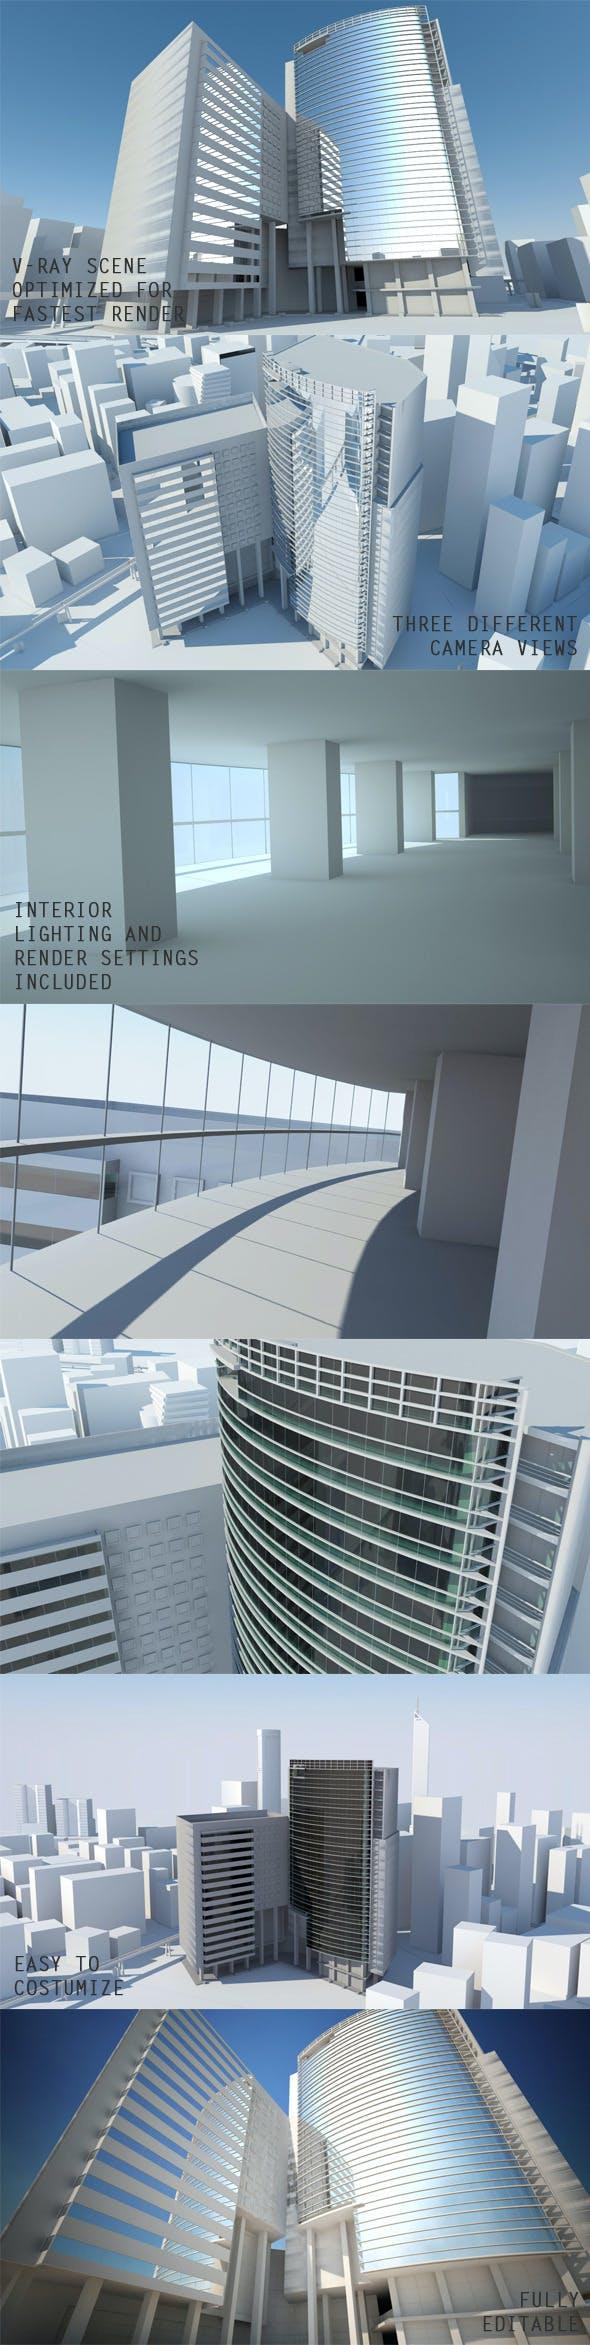 Exterior Scene  - 3DOcean Item for Sale